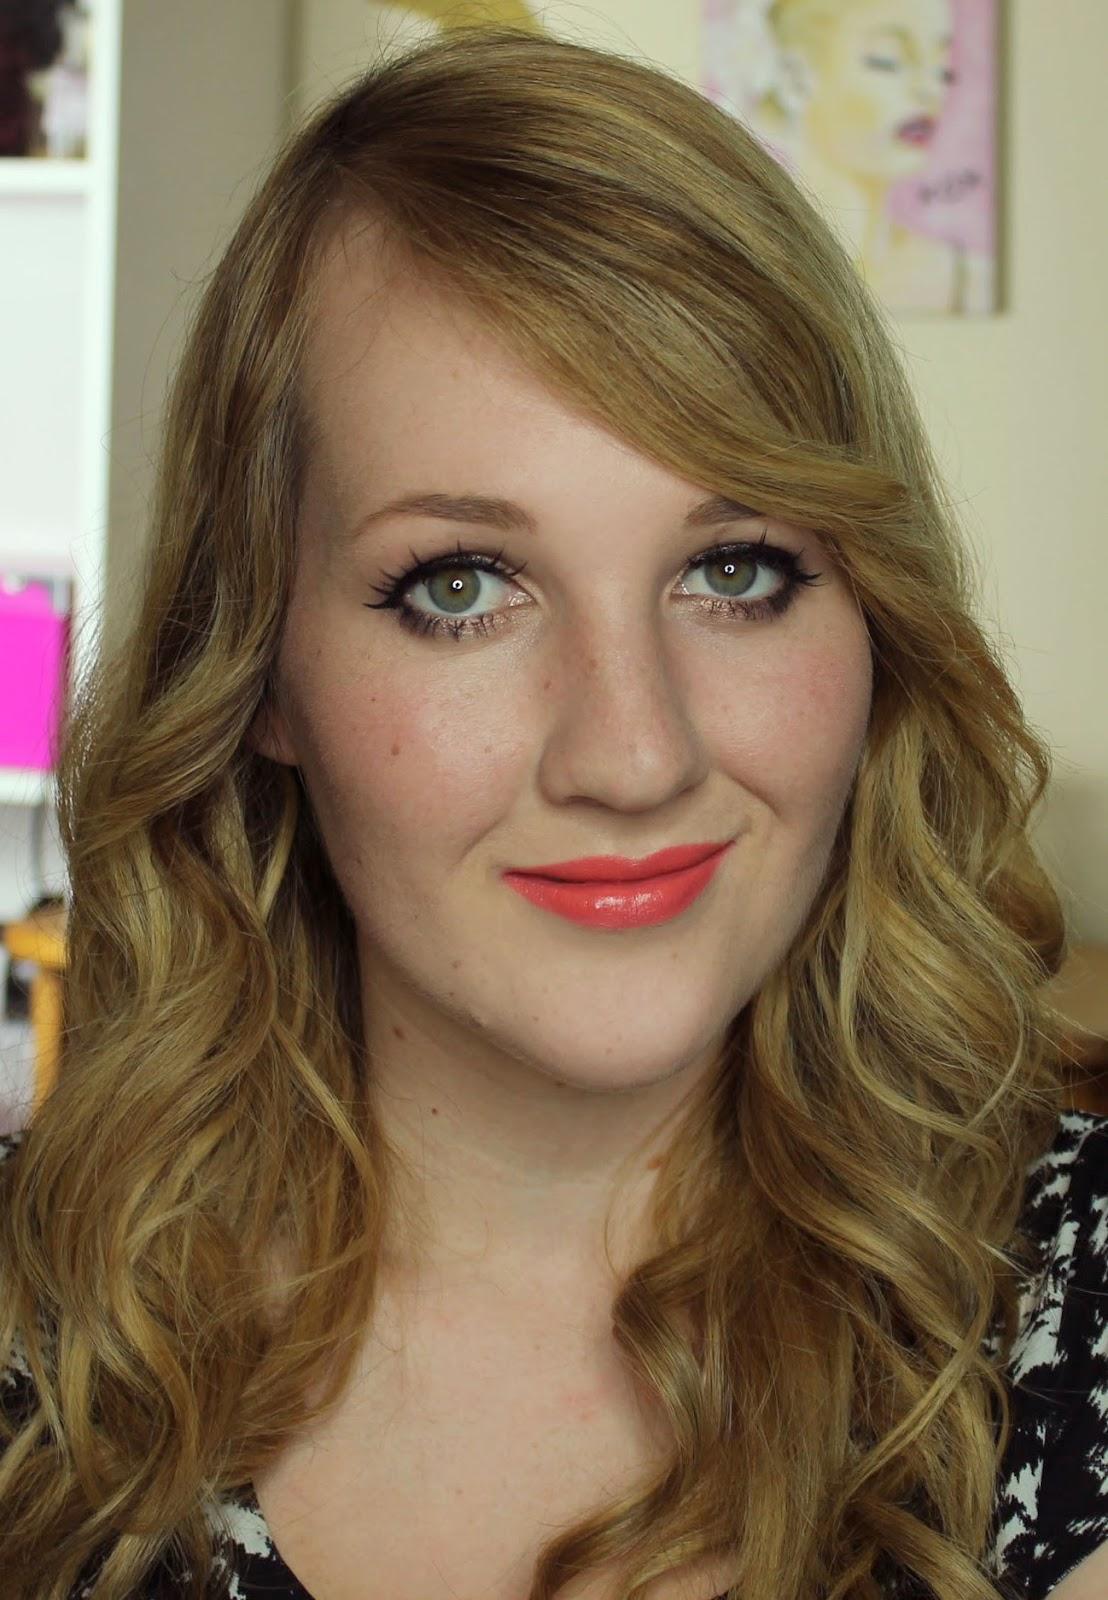 MUA Lipsticks - #16 Nectar Swatches & Review